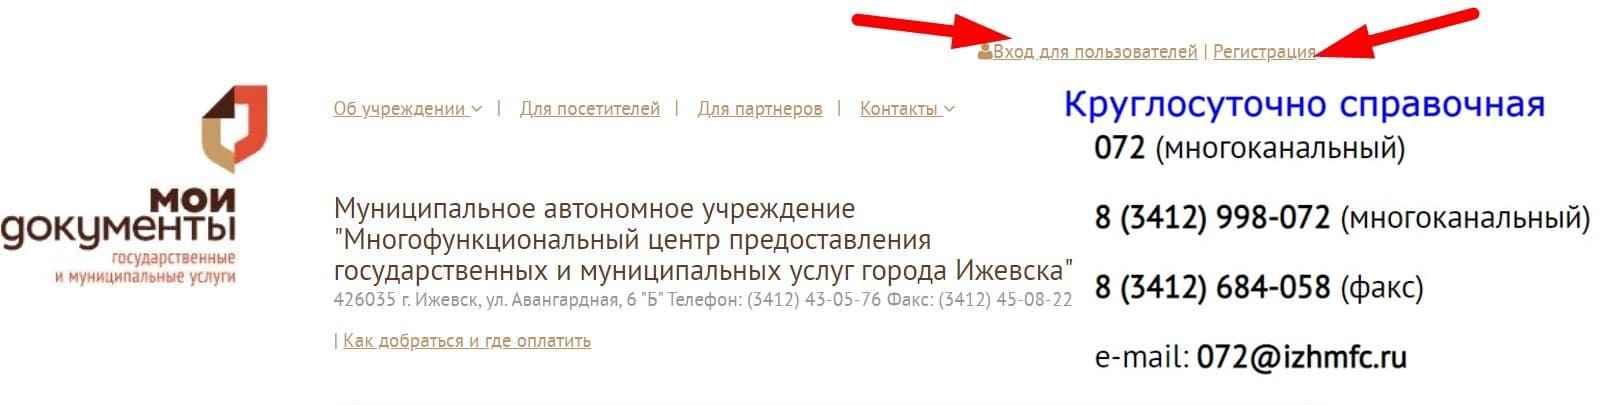 Ижевский МФЦ показания счетчиков